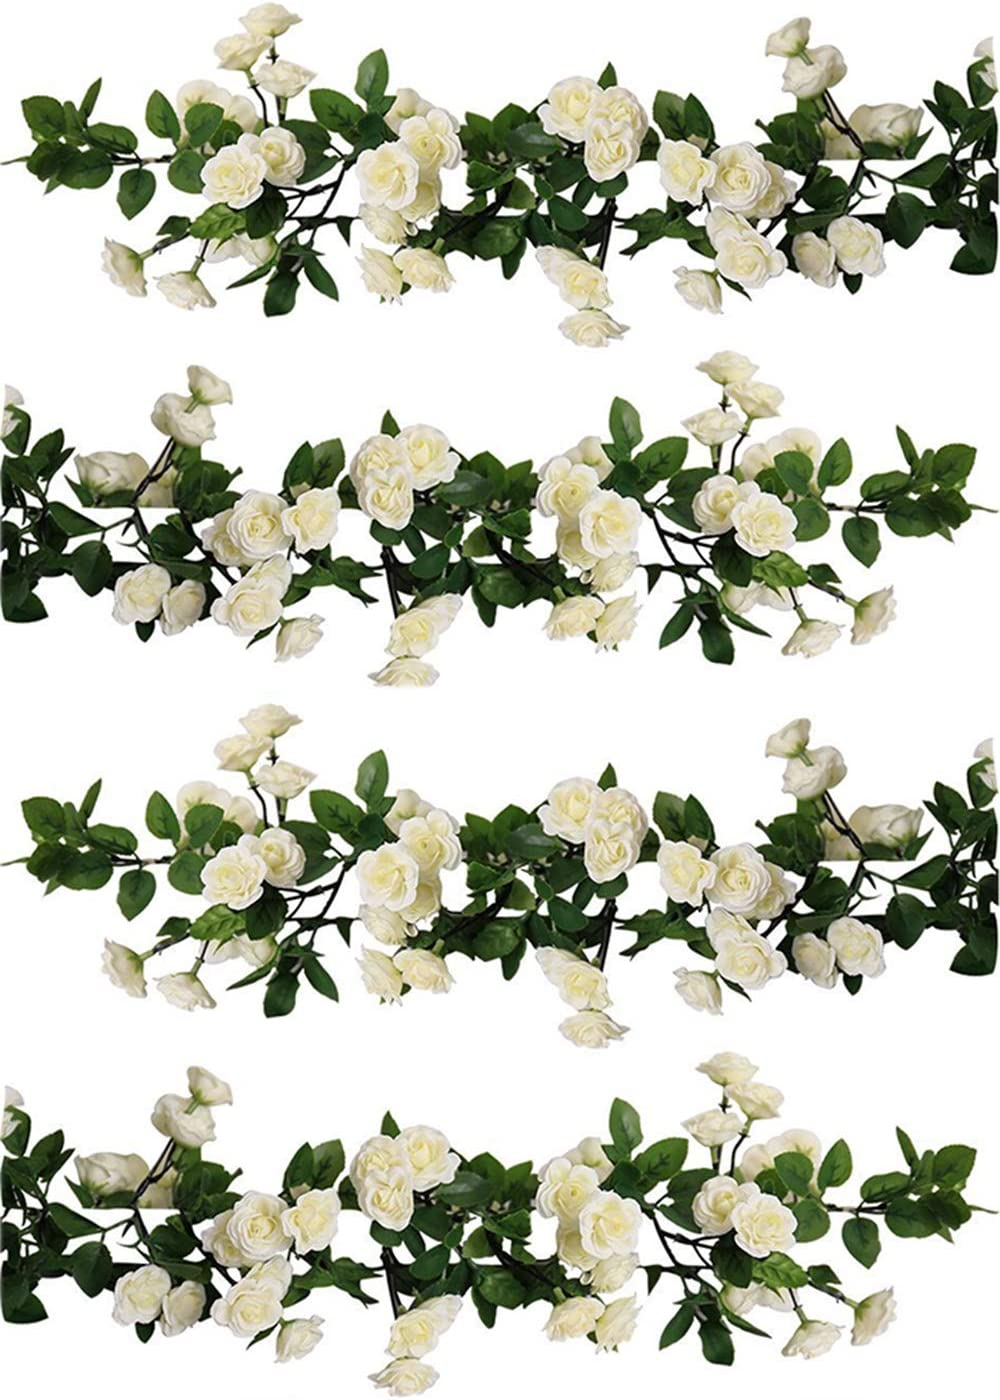 UArtlines 2 Pack 5.84Ft Each Strand 69 small rose flowers WHITE Artificial Flower Hanging Rose Flower Ivy Garland Artificial Rose Garland Home Party Garden